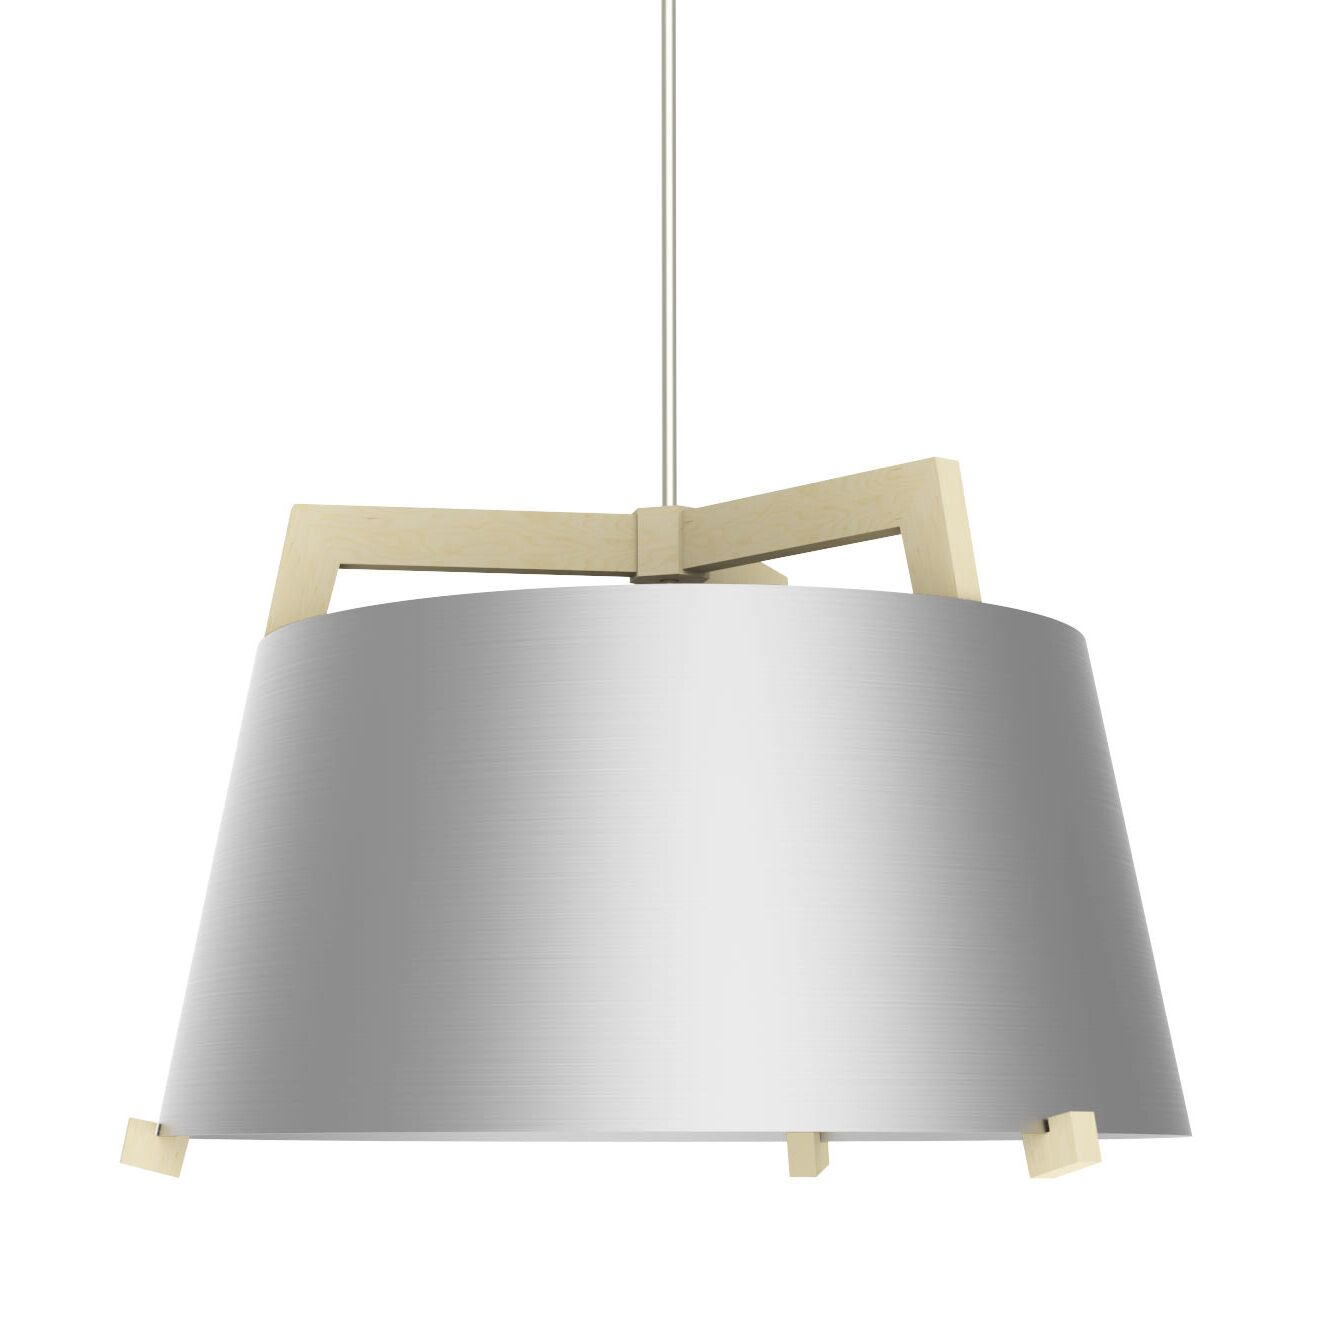 Ignis 1-Light LED Cone Pendant Size: 11.5